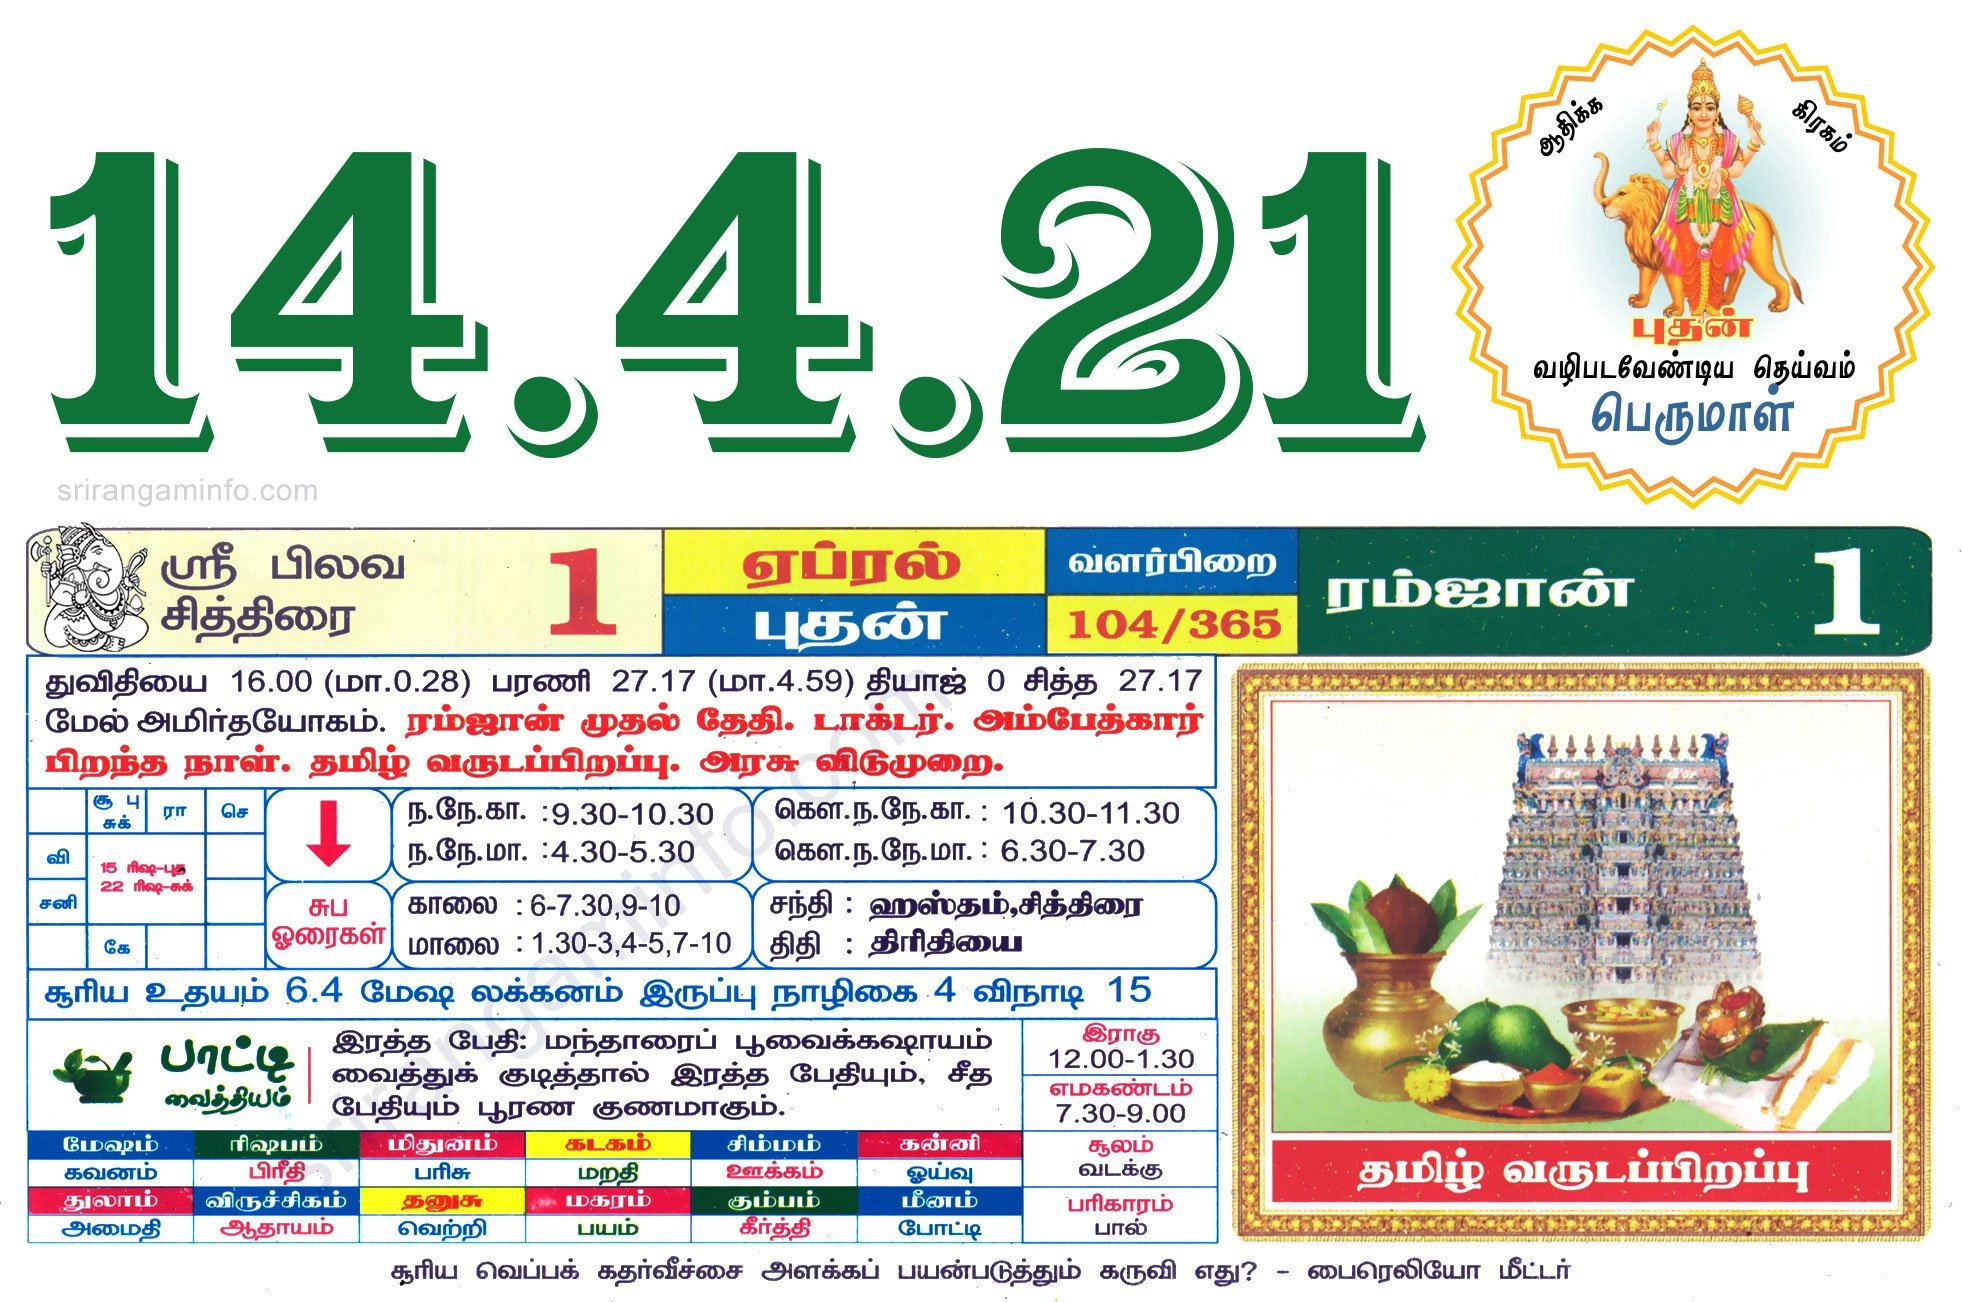 Tamil Daily Calendar 2021, Tamil Calendar 2021, Nalla Neram - தமிழ் தினசரி காலண்டர் in 2021 Tamil Calendar Holidays Image